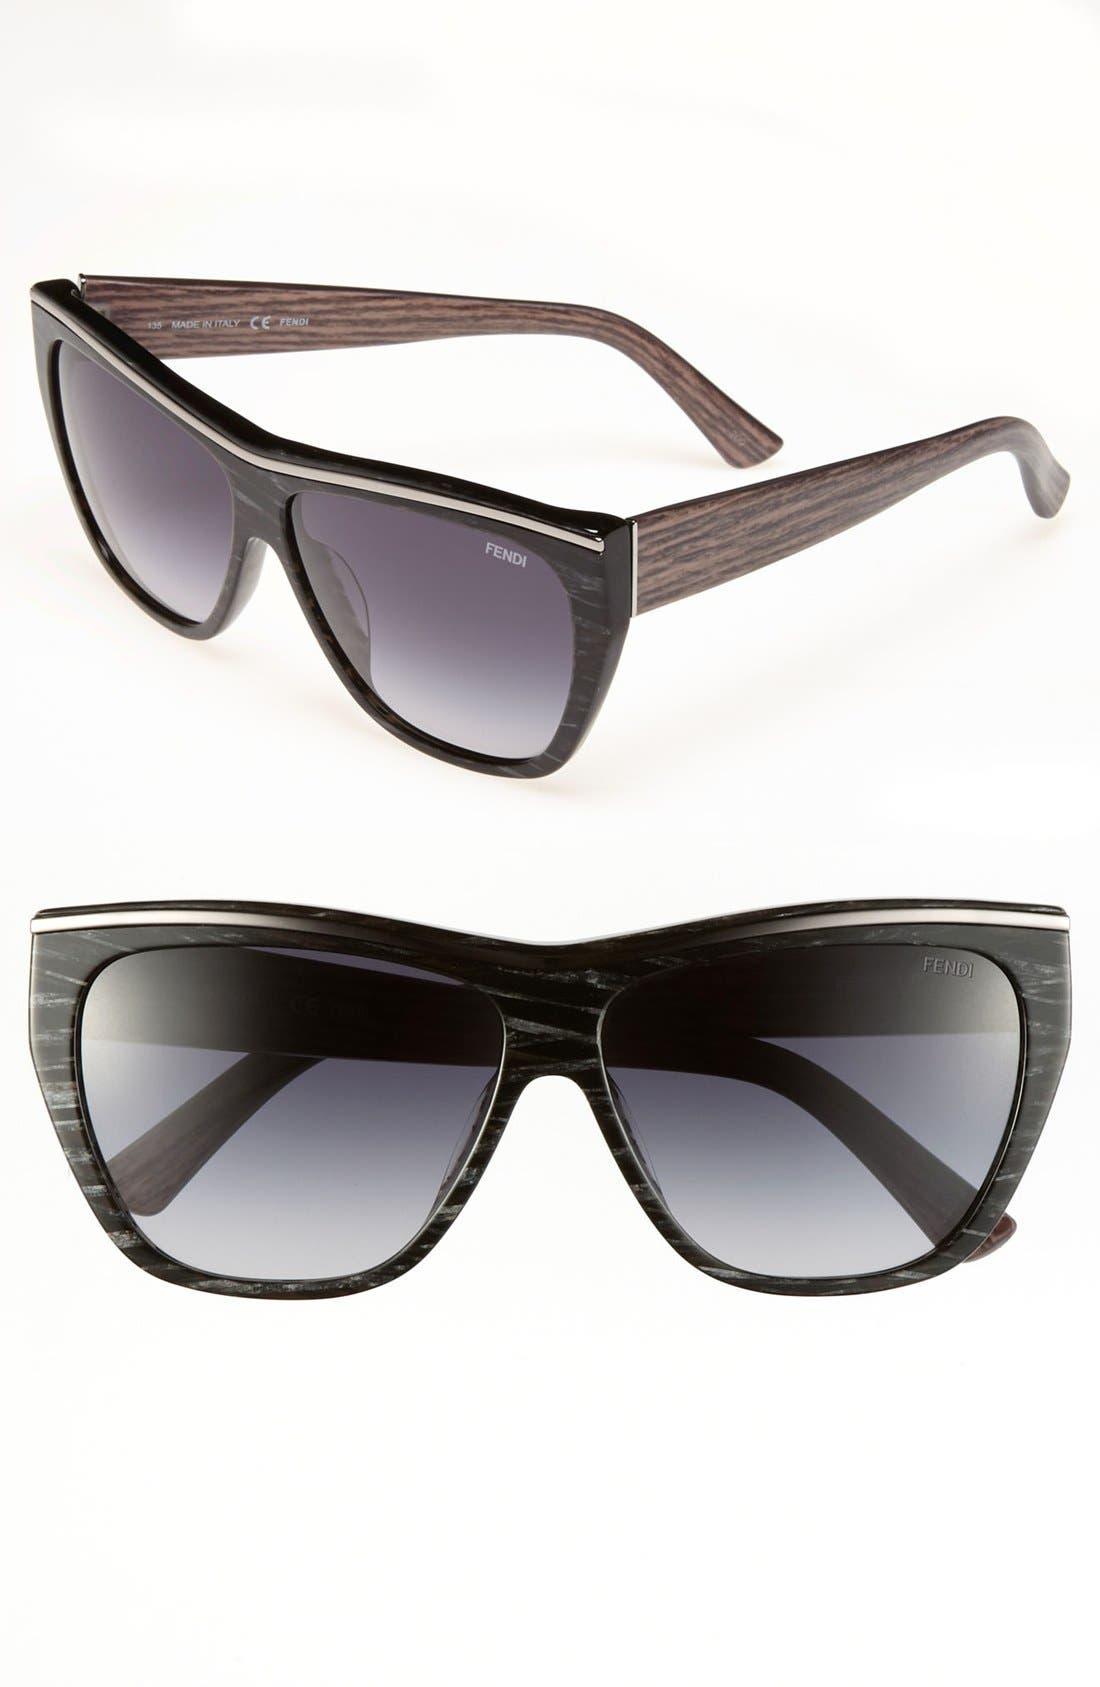 52mm Retro Sunglasses,                             Main thumbnail 1, color,                             002